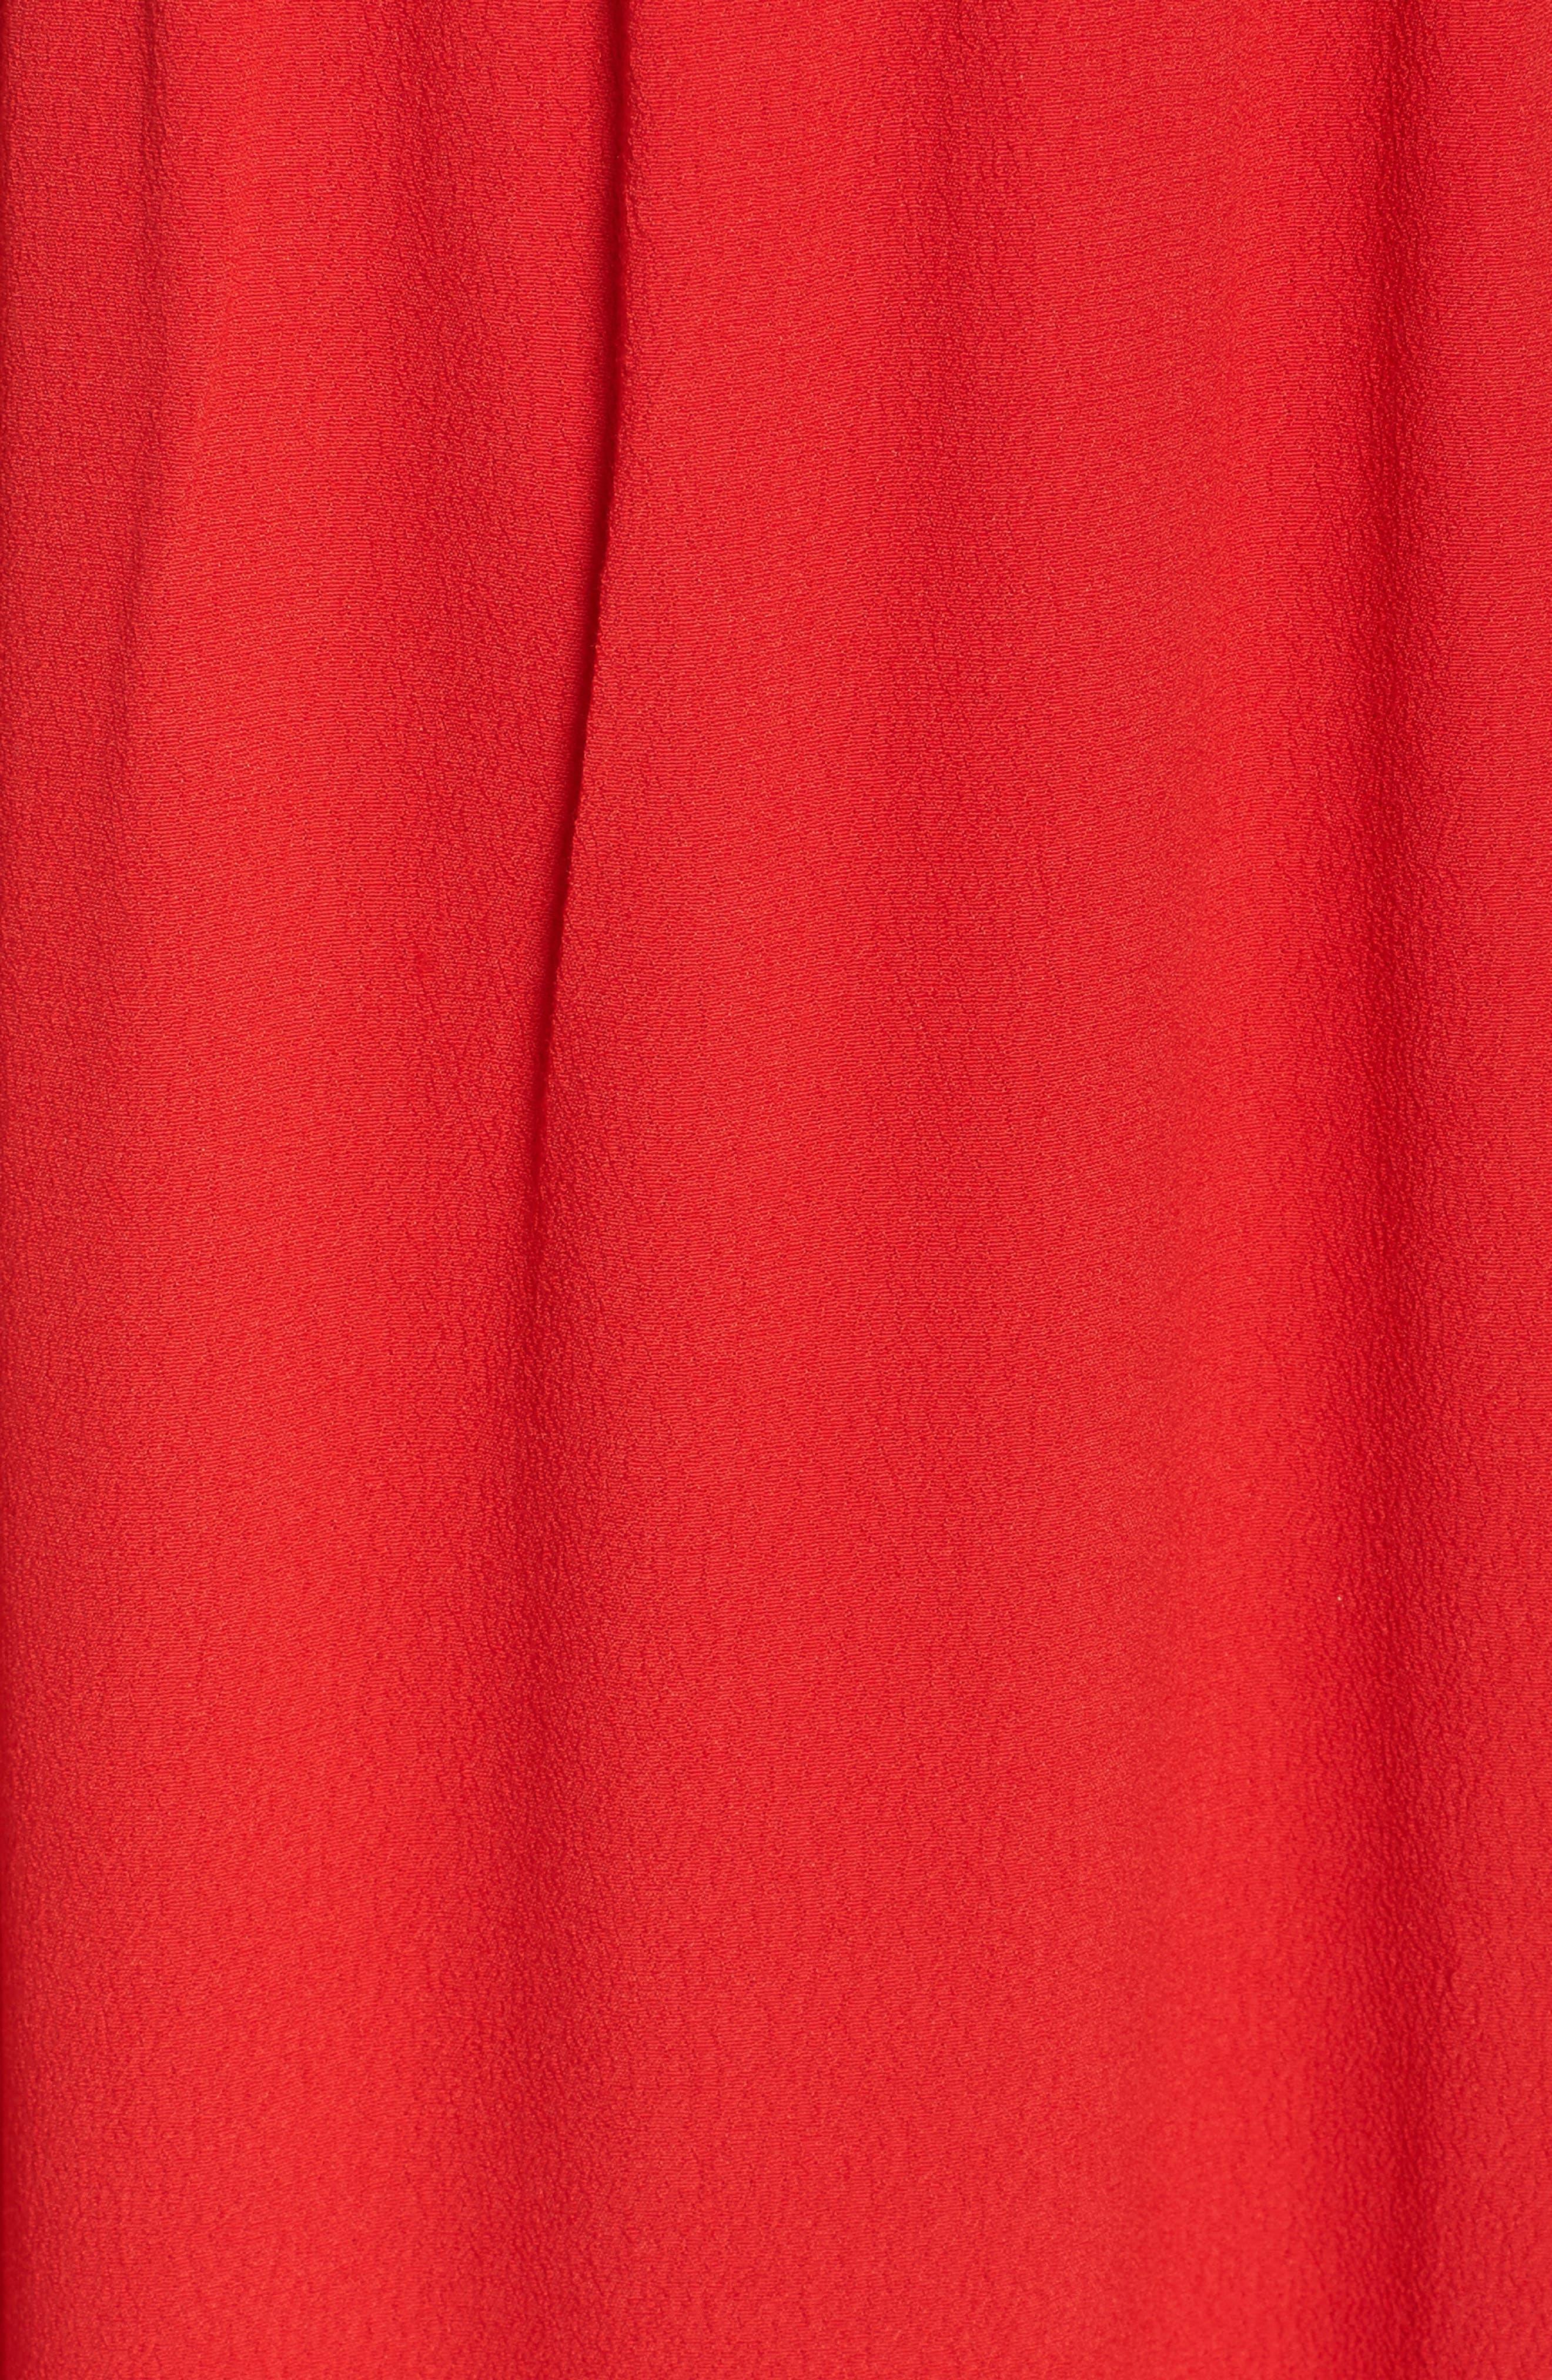 Cold Shoulder Midi Dress,                             Alternate thumbnail 5, color,                             600